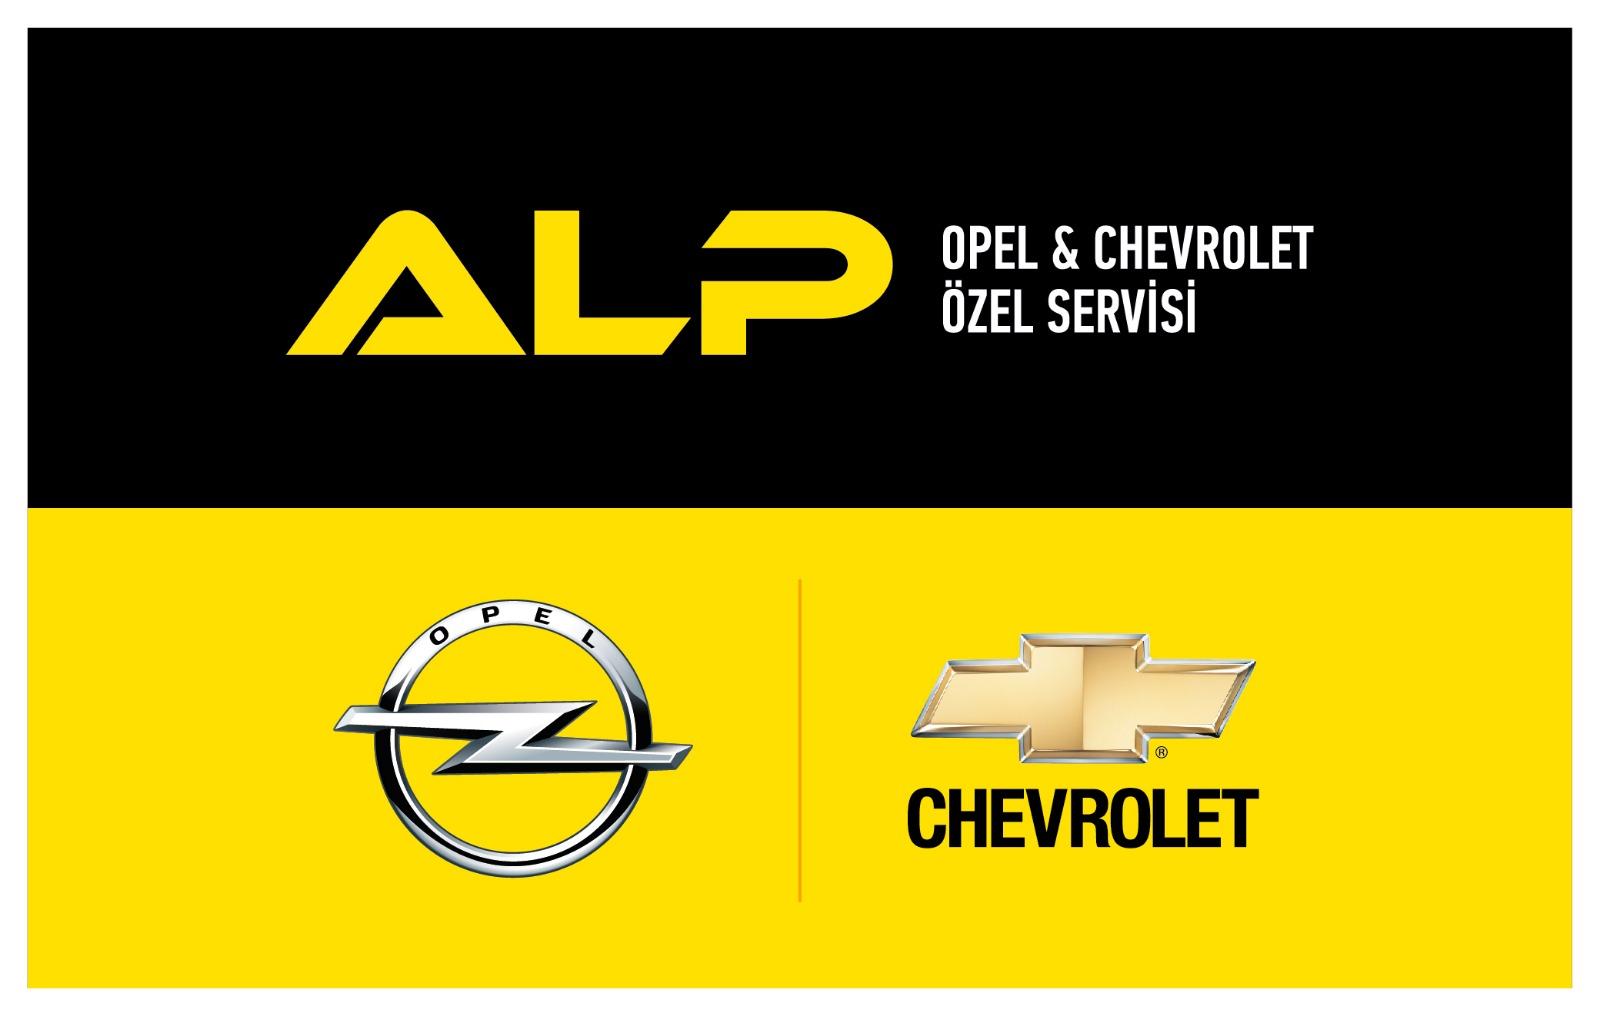 Opel servisi,Chevrolet servisi